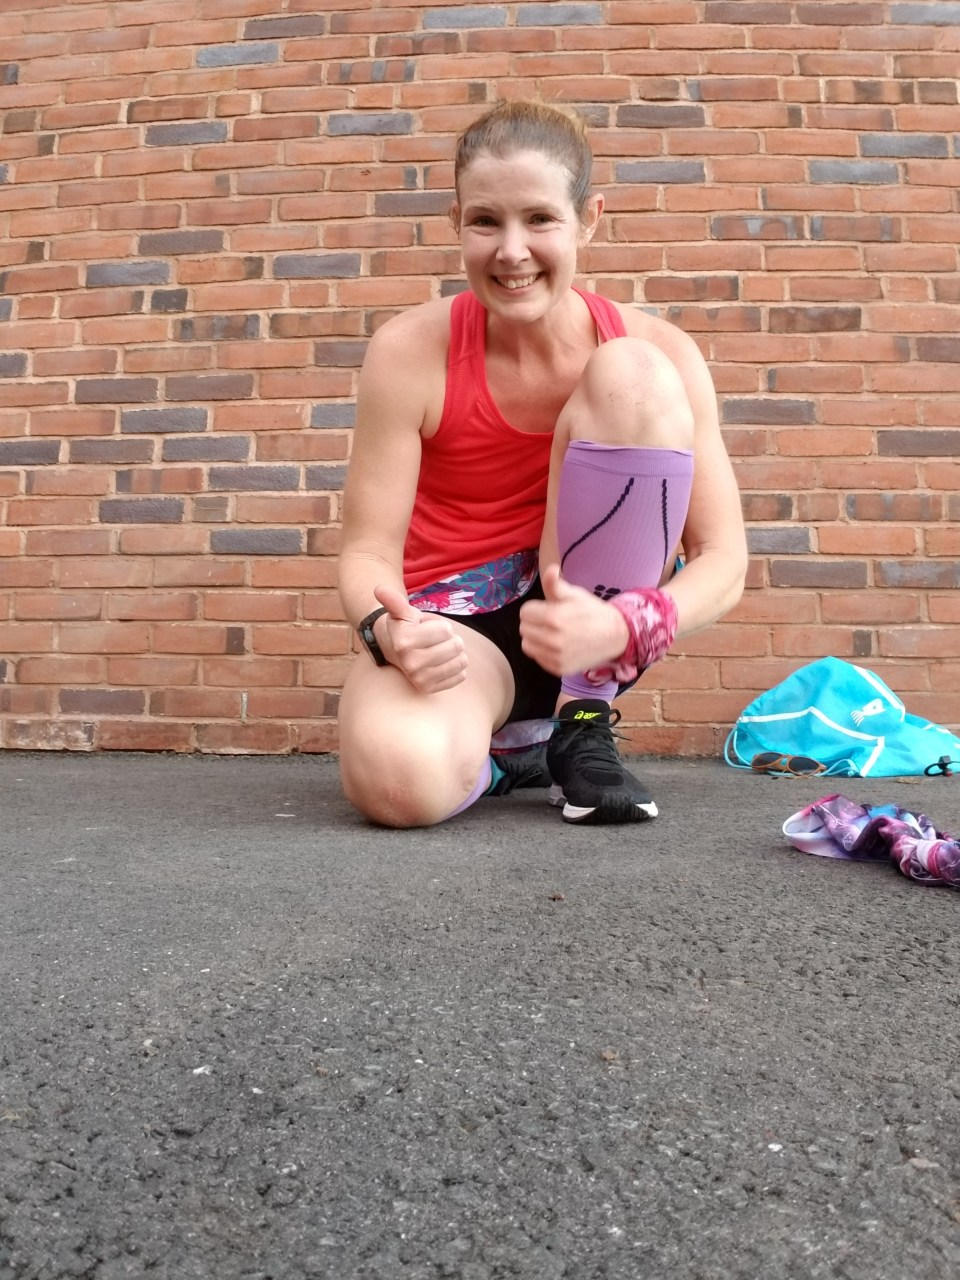 Marathon Training - saturday run done!